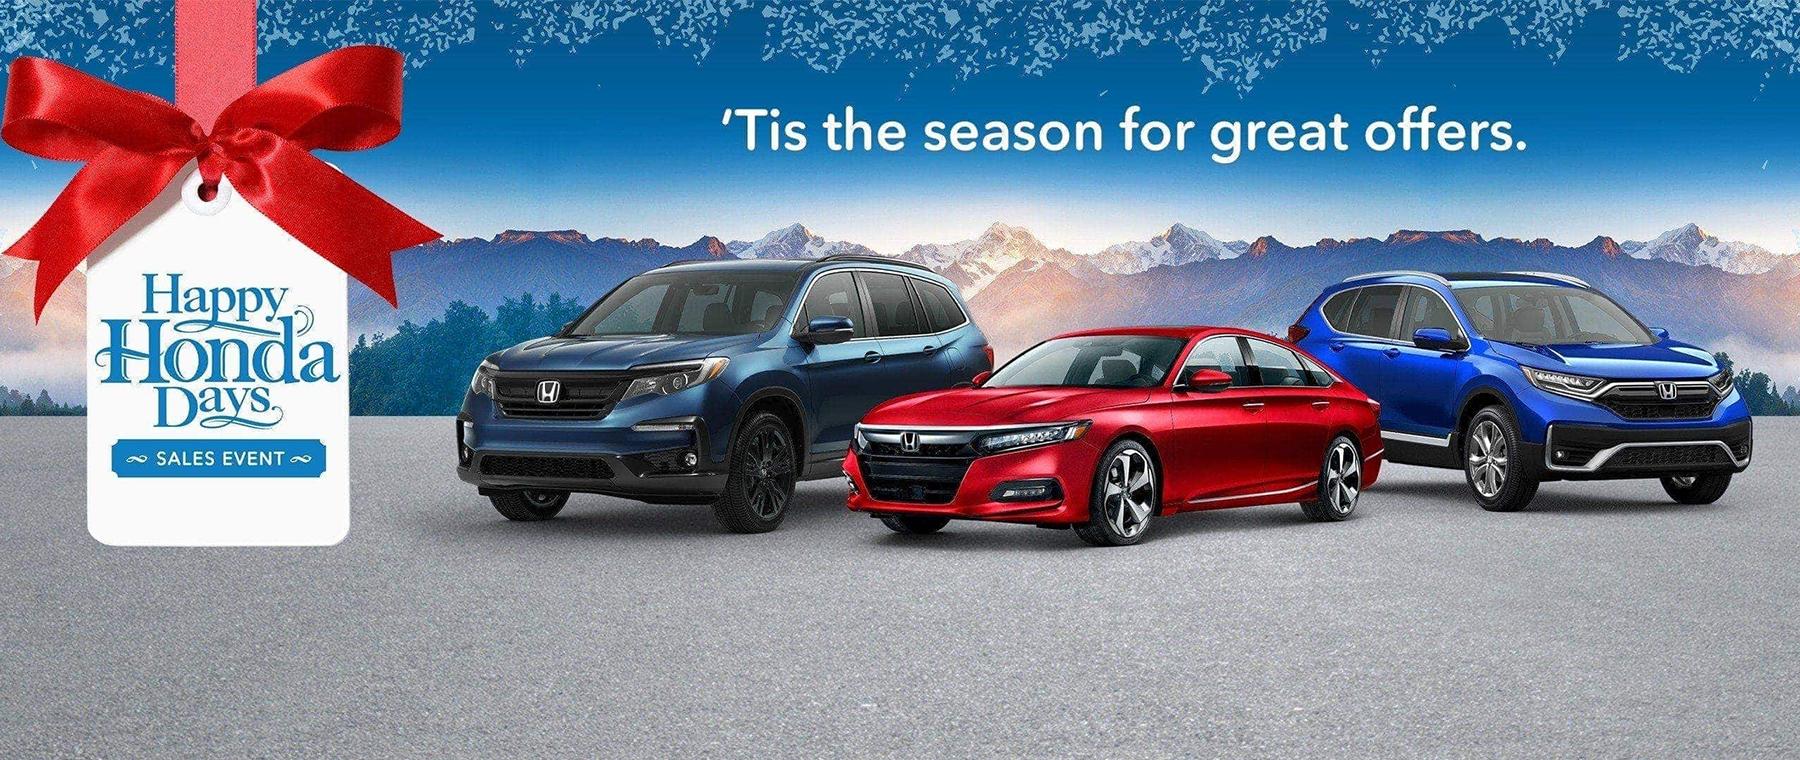 Happy Honda Days Event